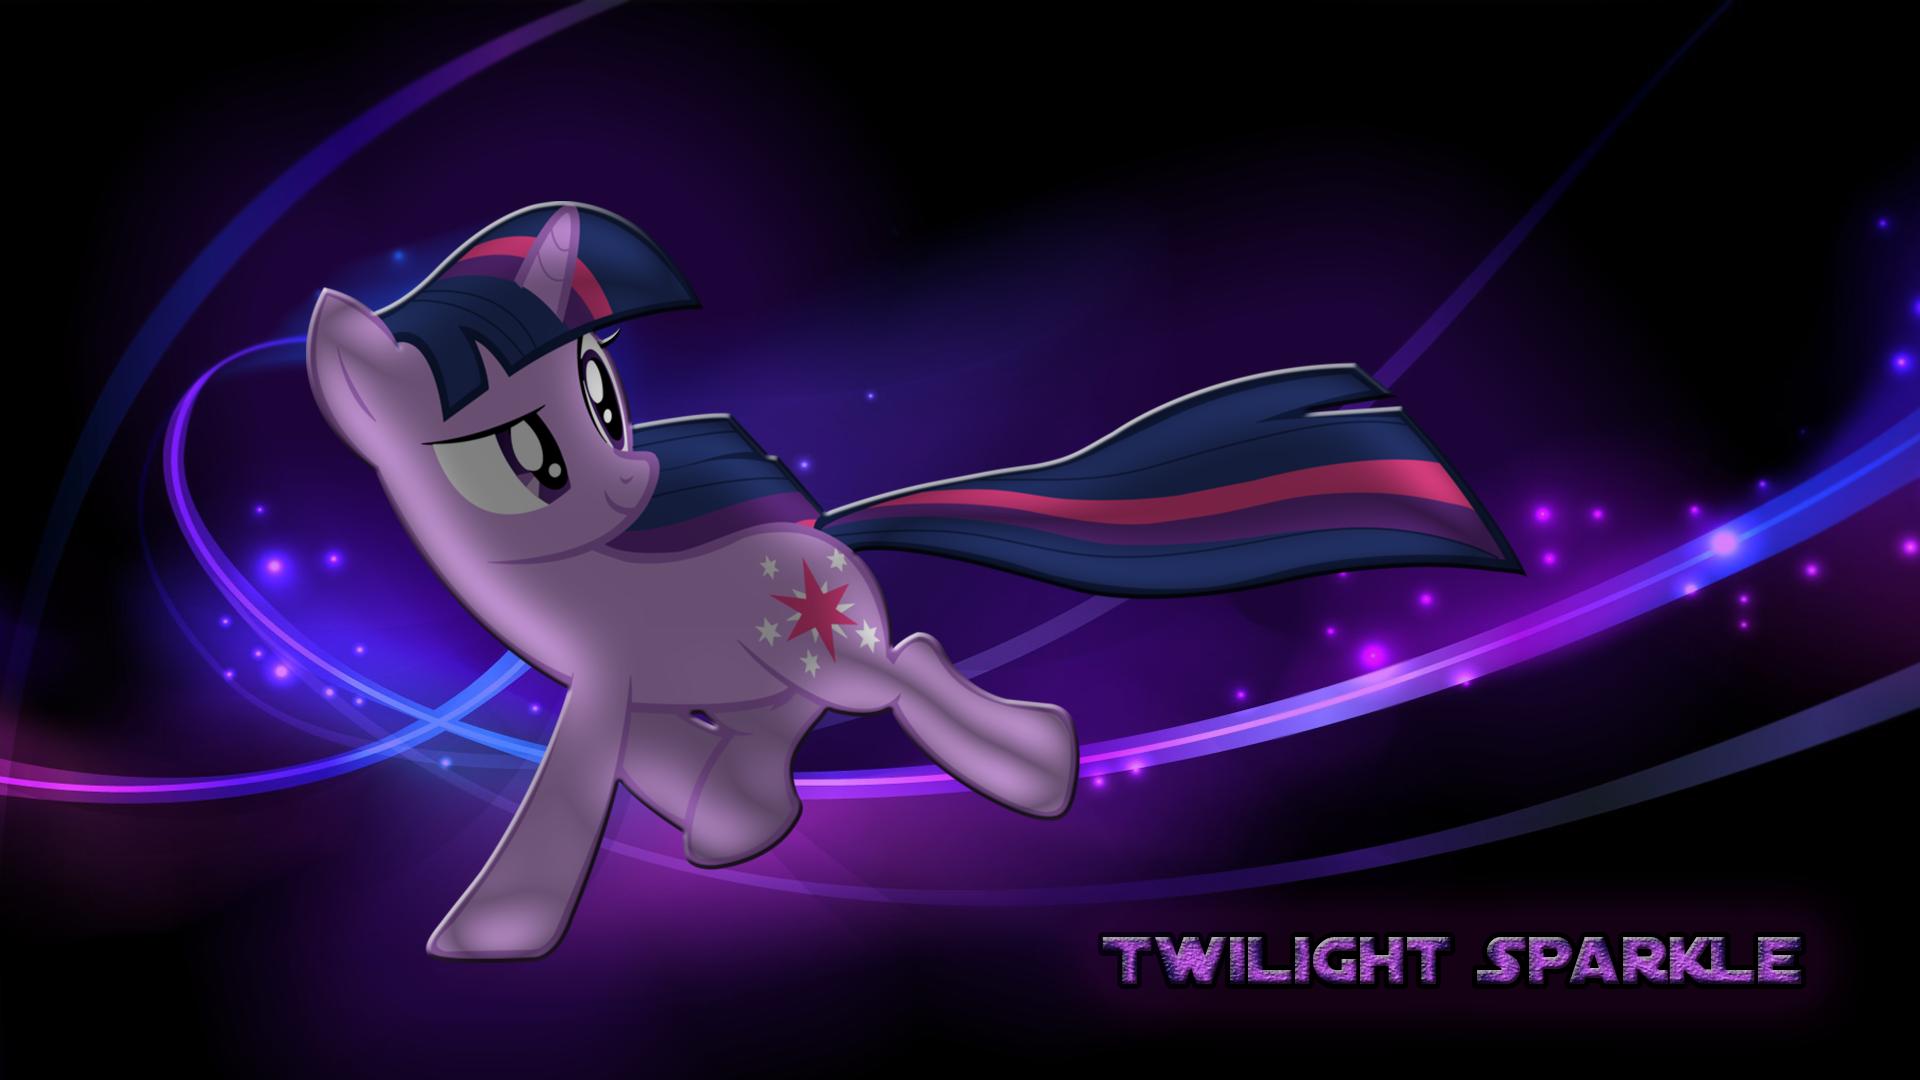 twilight sparkle wallpaper - photo #12